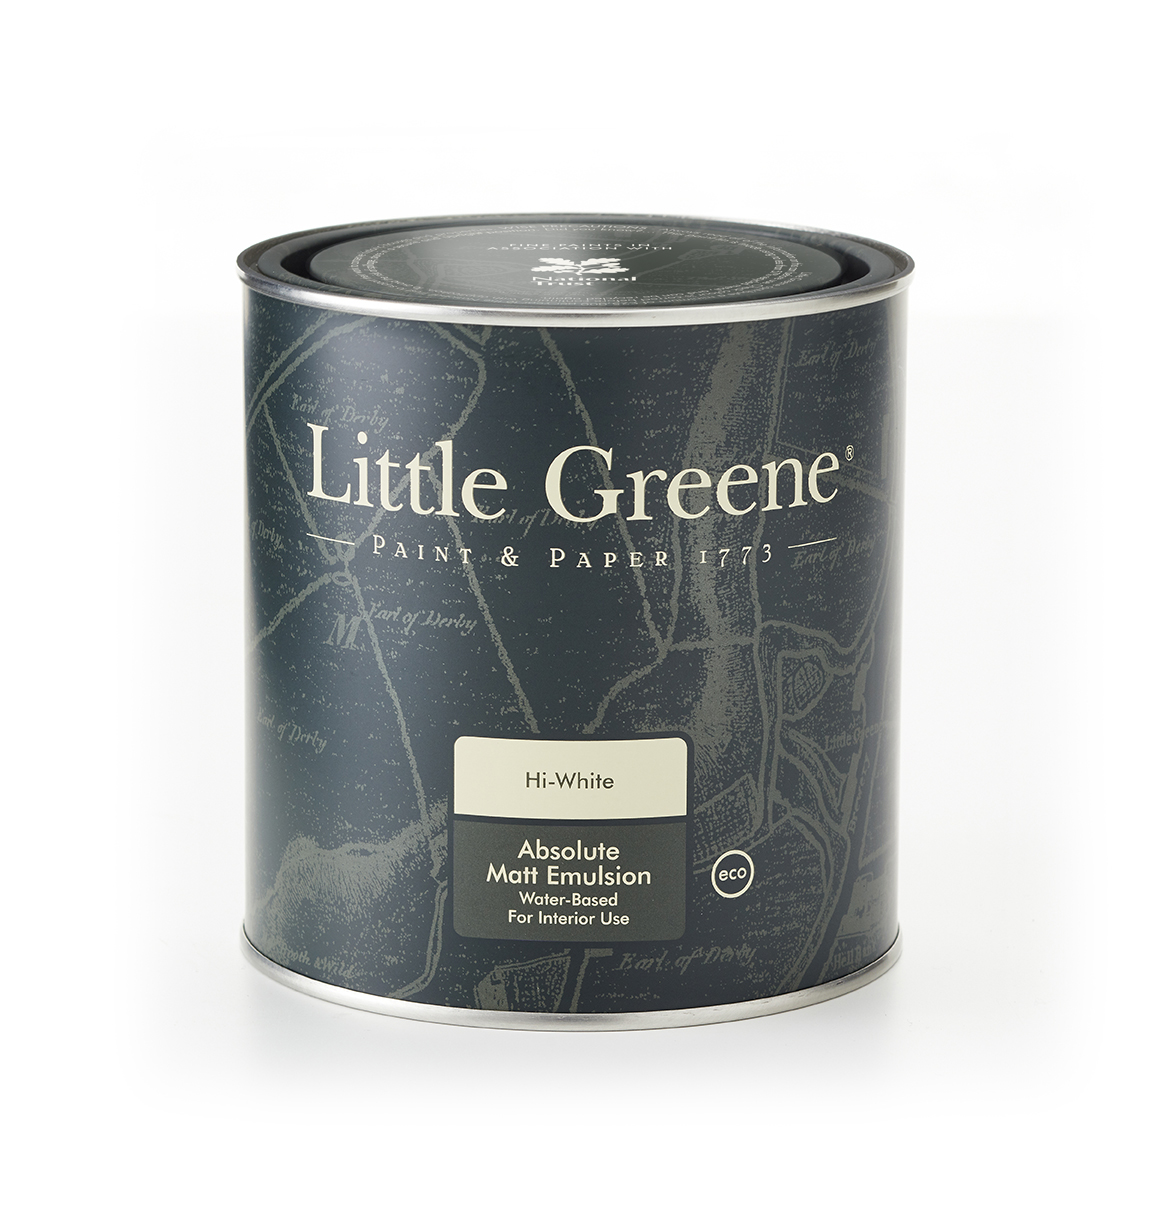 Produktkategorie Little Greene